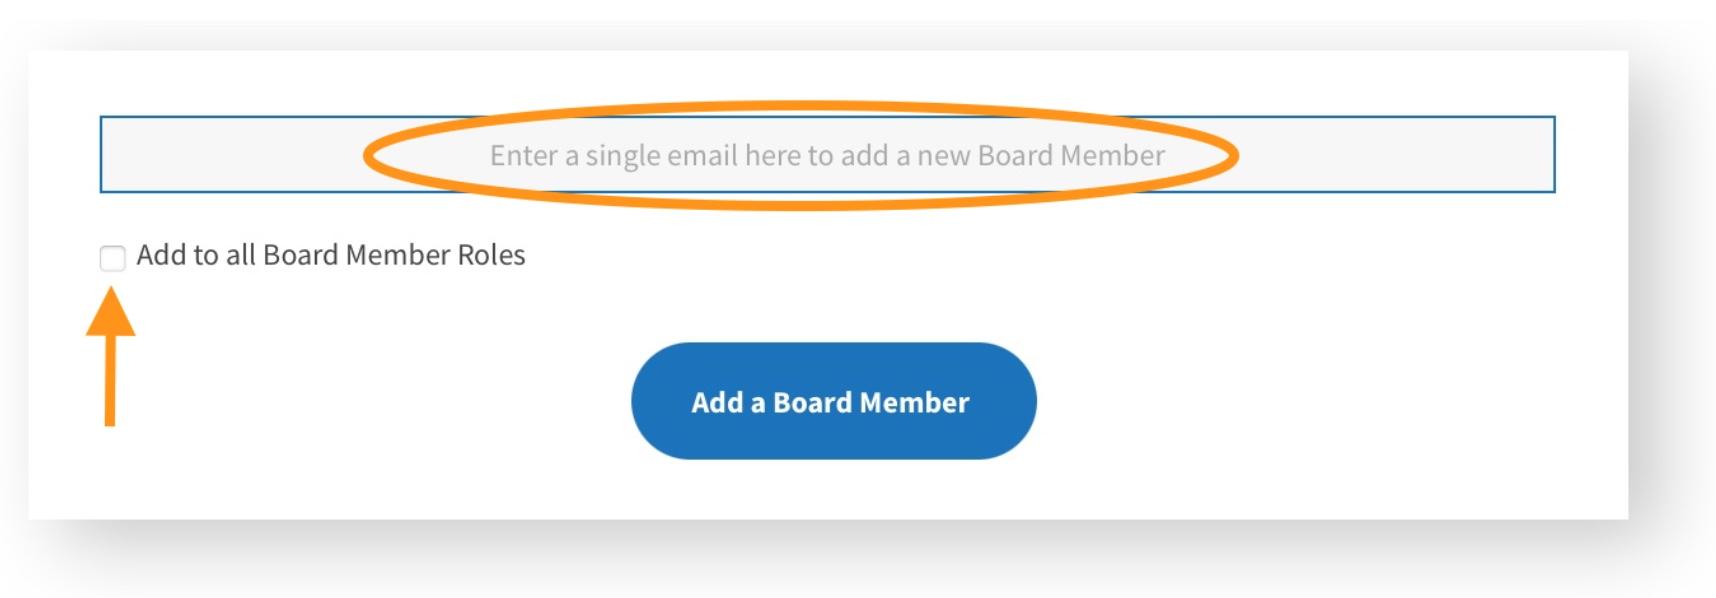 pooldues-add-new-board-member